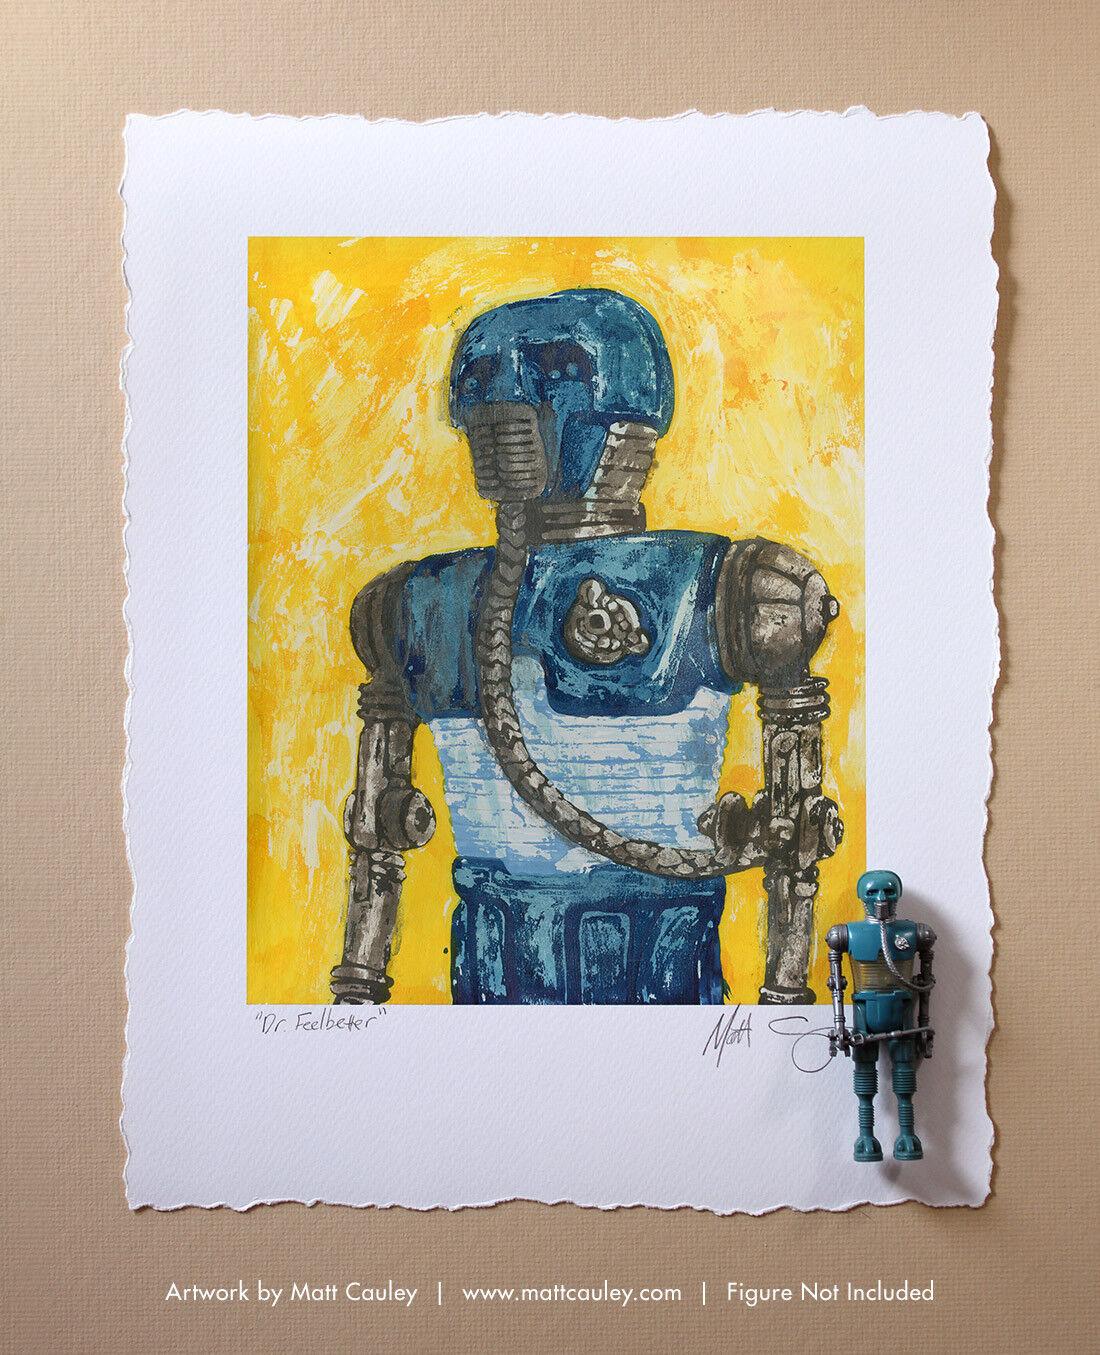 2-1B Vintage Kenner Star Wars Action Figure ORIGINAL ART PRINT 3.75 21B